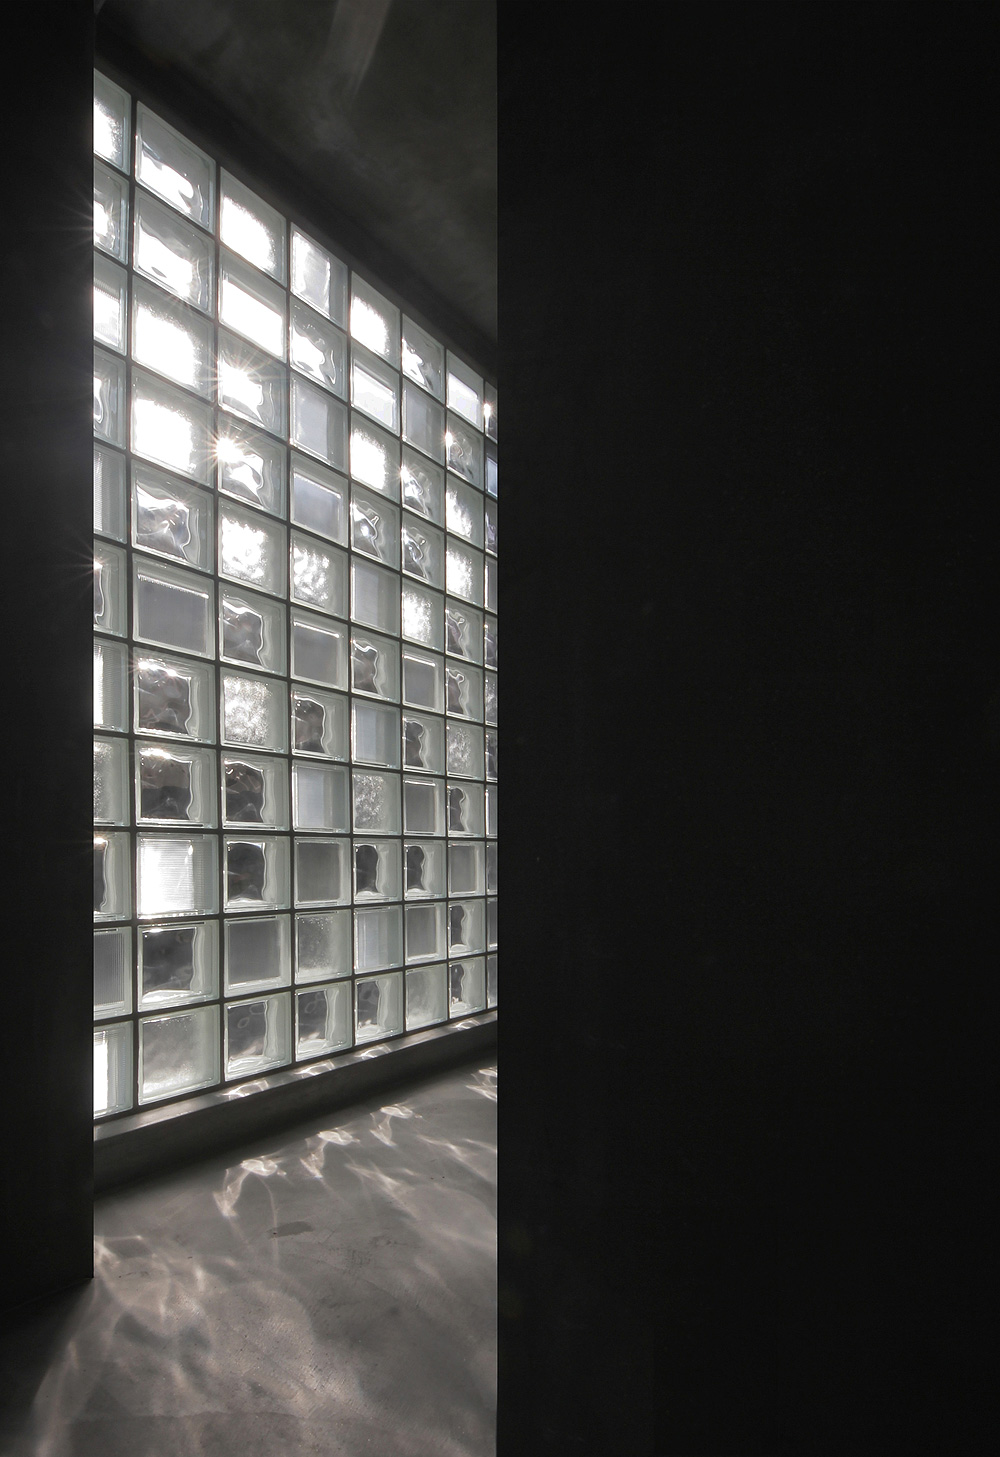 vivienda y galeria de arte jun murata (7)